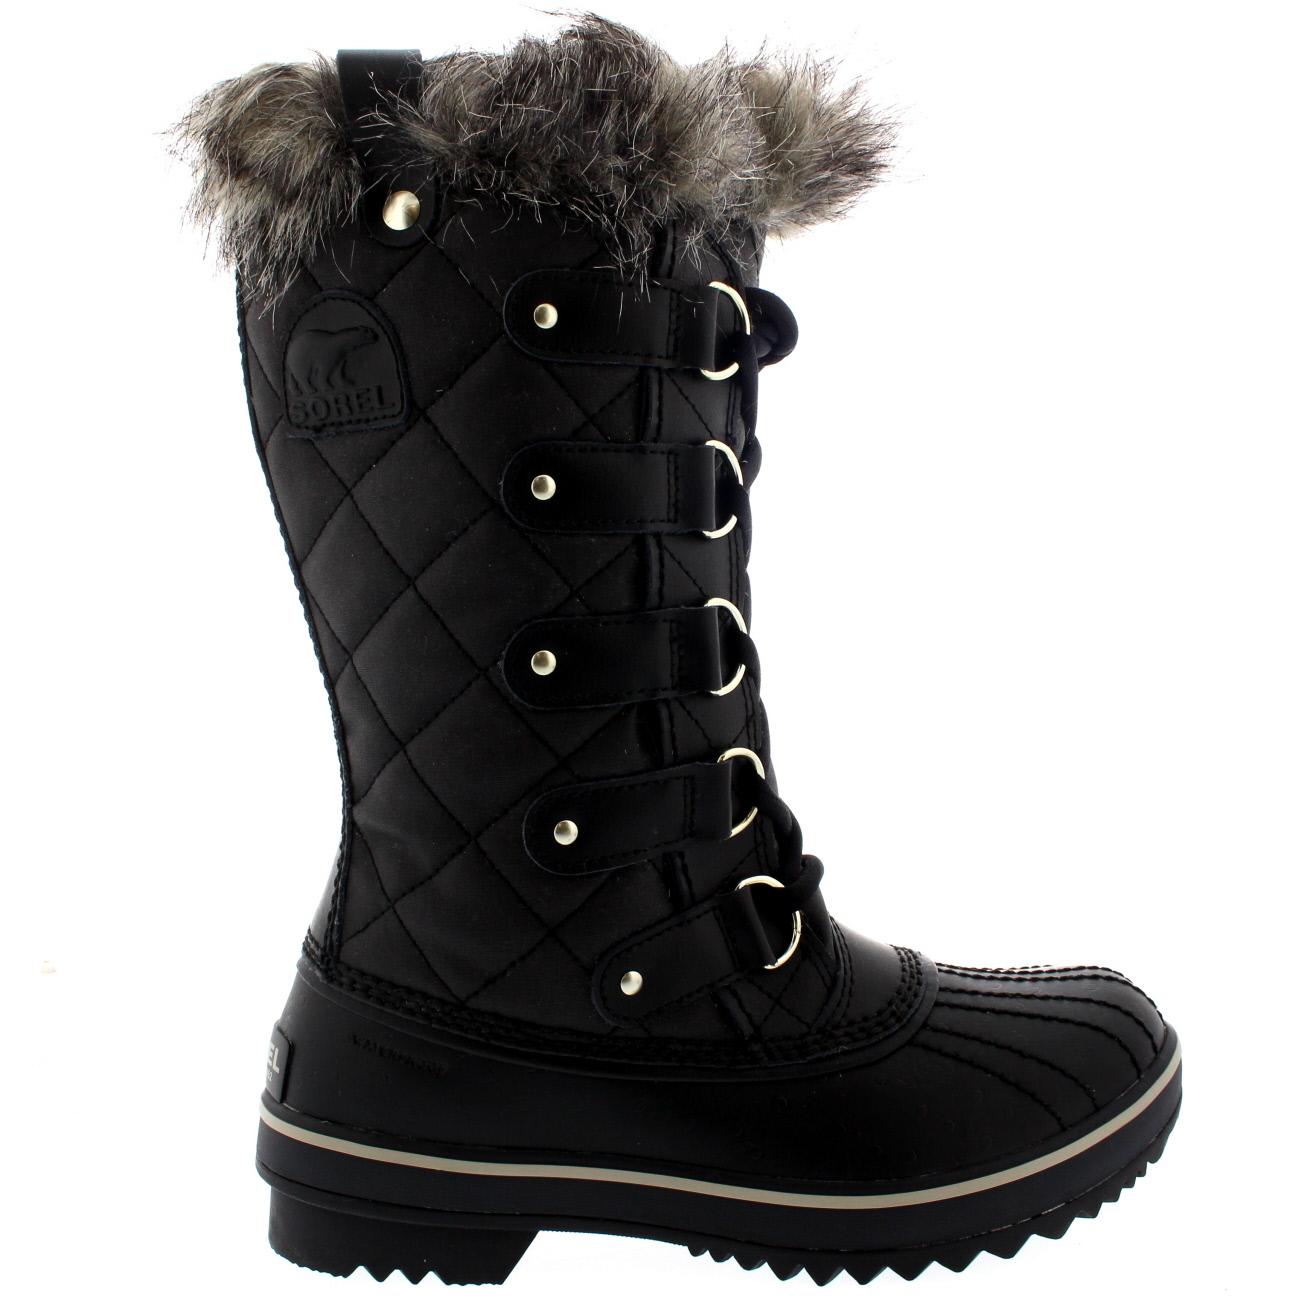 Womens Sorel Tofino Leather Snow Black Winter Fur Lace Up ...